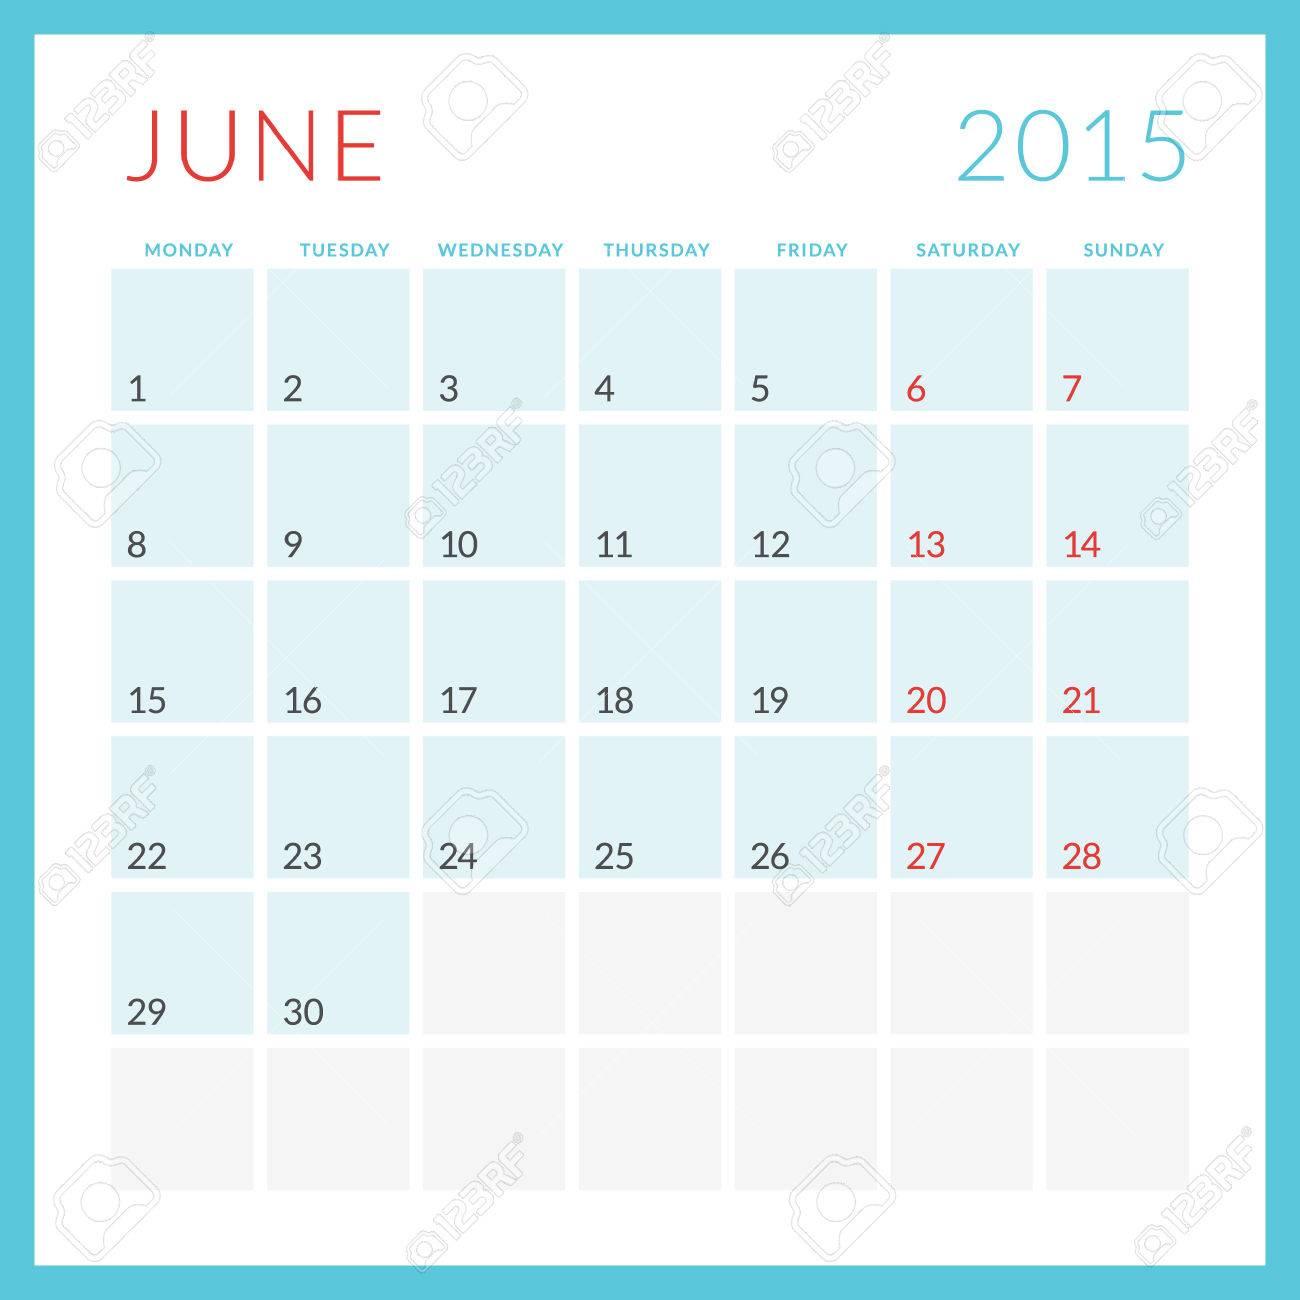 microsoft printable calendar 2015